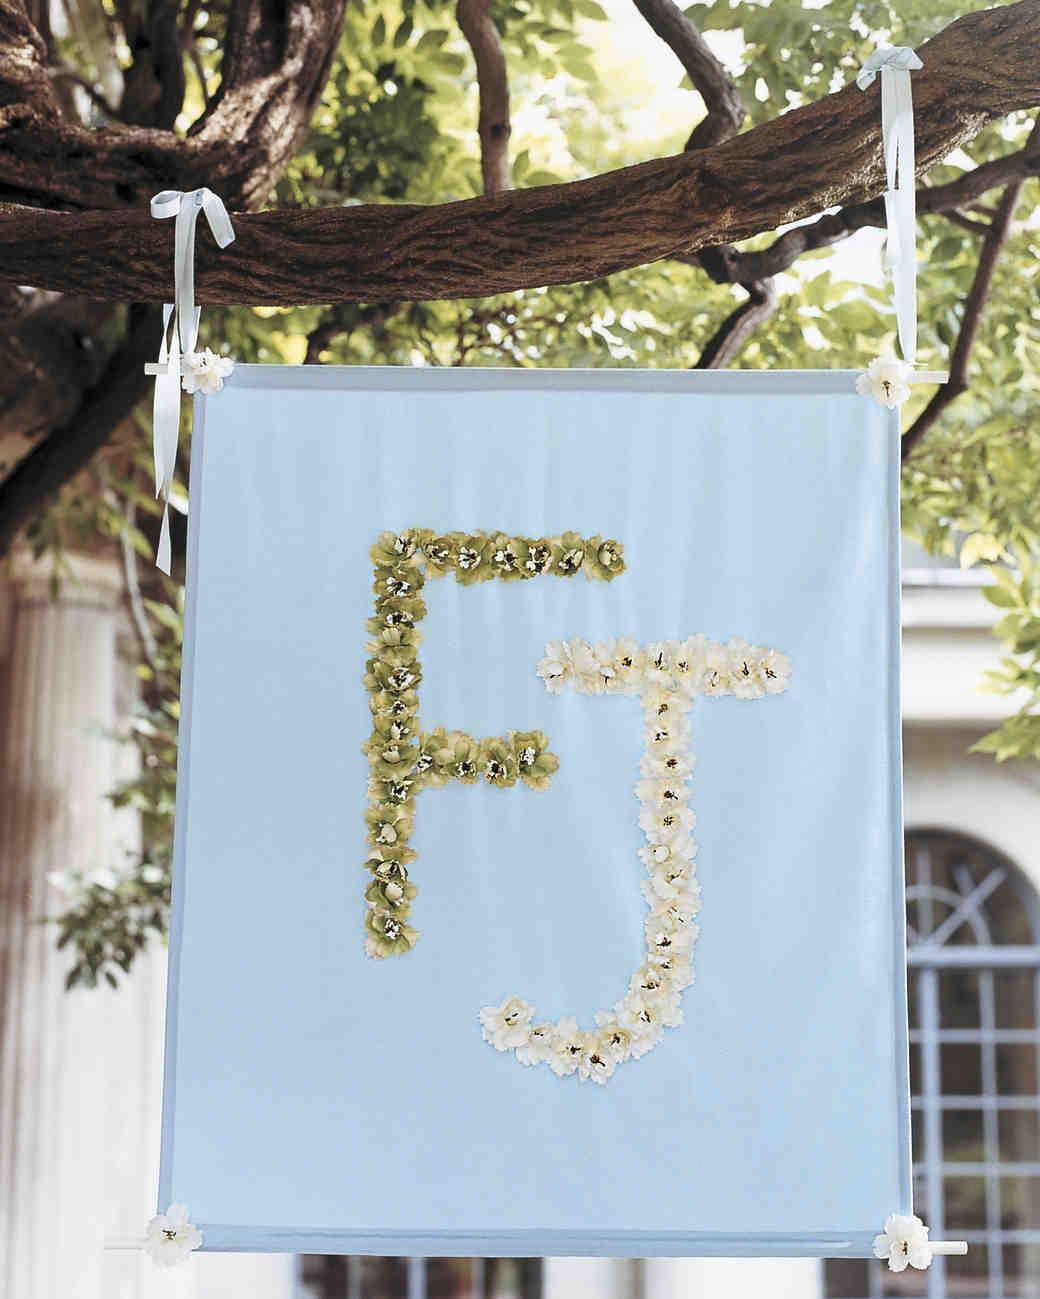 Outdoor Wedding Decorations That Are Easy To DIY   Martha Stewart Weddings